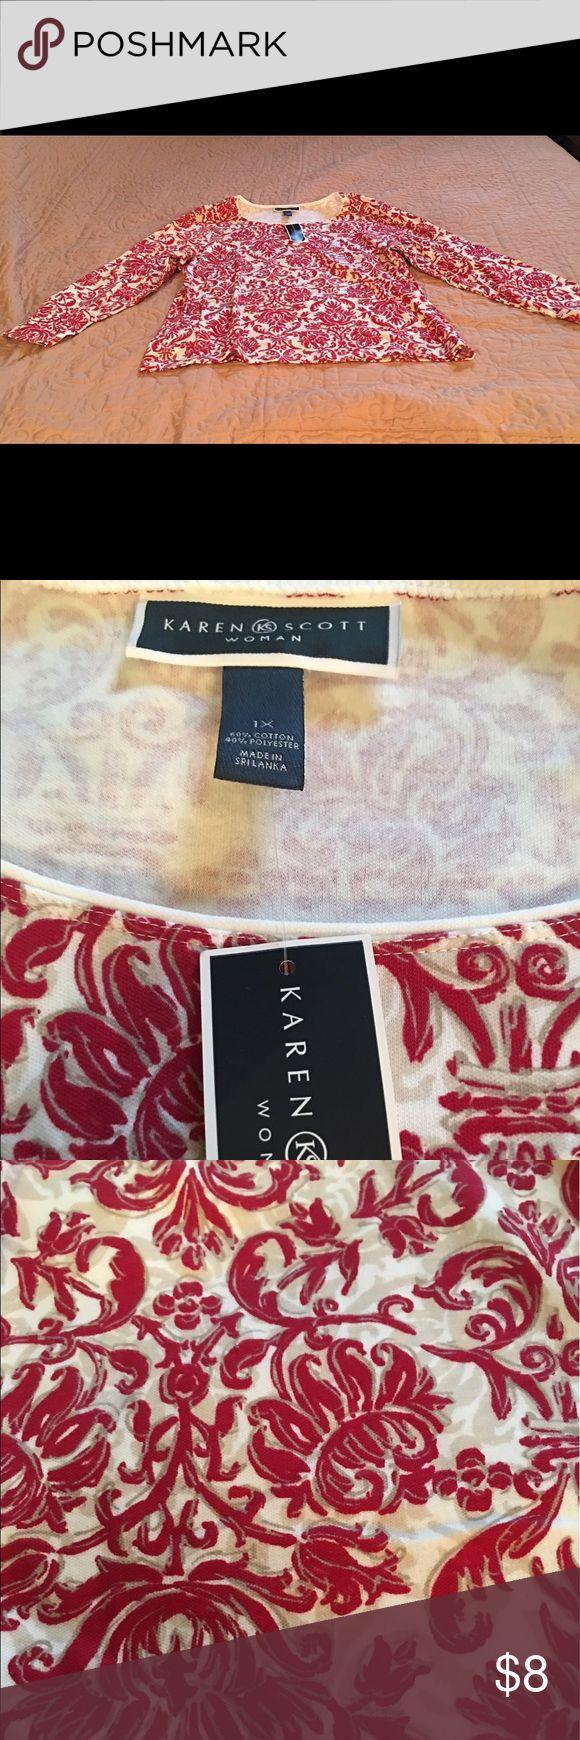 🌹 NEW Karen Scott brand long sleeve Top 🌹 NEW Karen Scott brand long sleeve knit Top. Pretty color combination of cream background with khaki and red floral print. NWT. Karen Scott Tops Tees - Long Sleeve